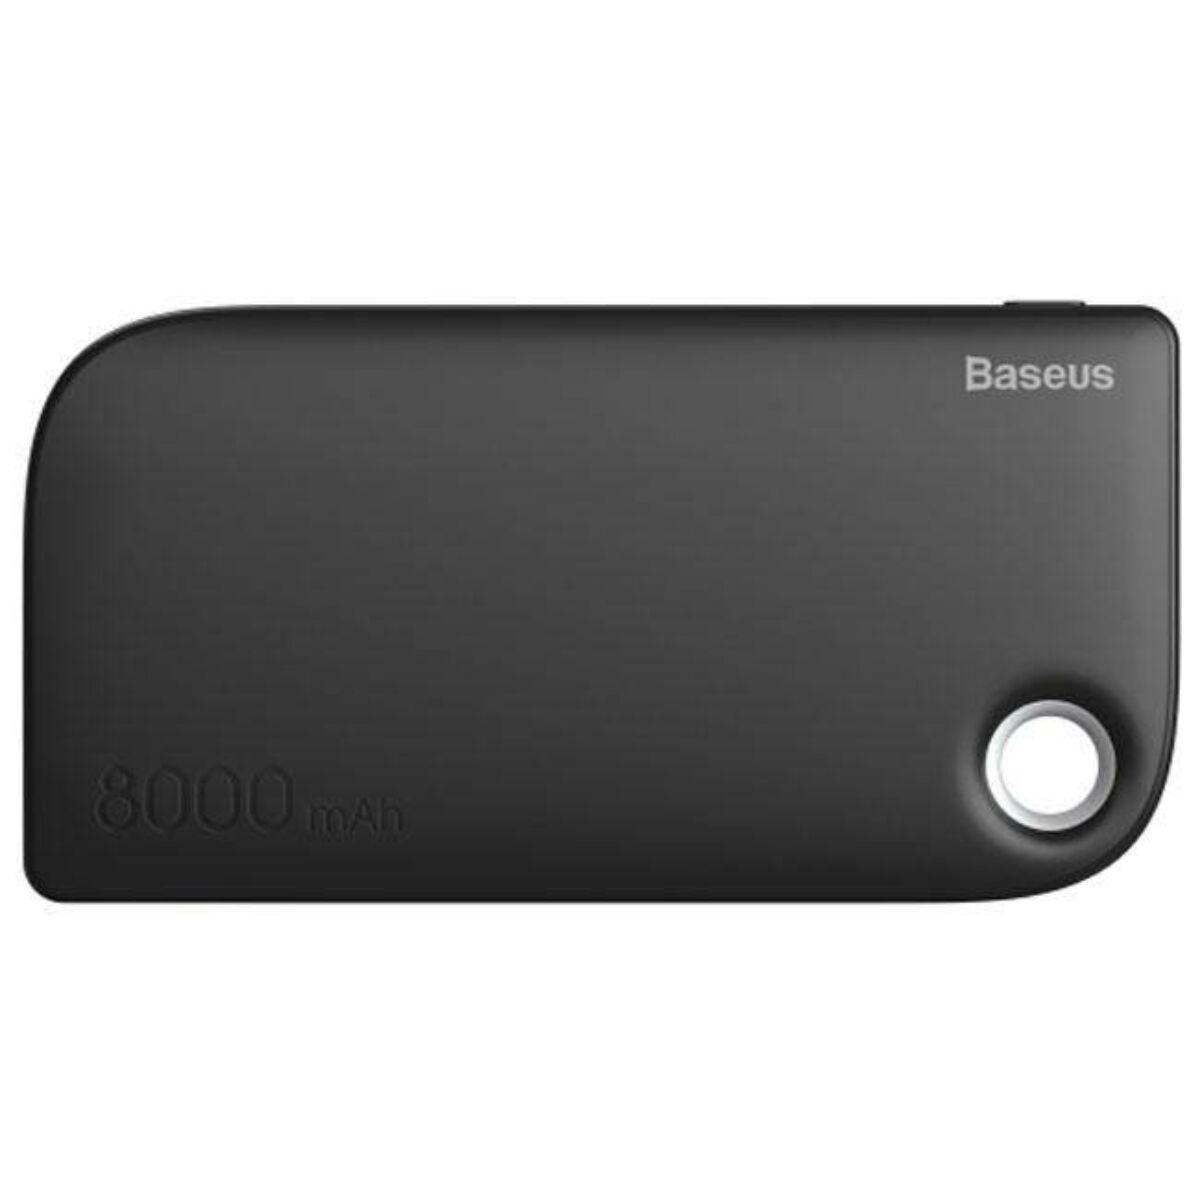 Baseus Power Bank Fan, (Micro USB bemenet / dupla USB kimenet), 2.4A, 8.000 mAh, fekete (PPM11-01)